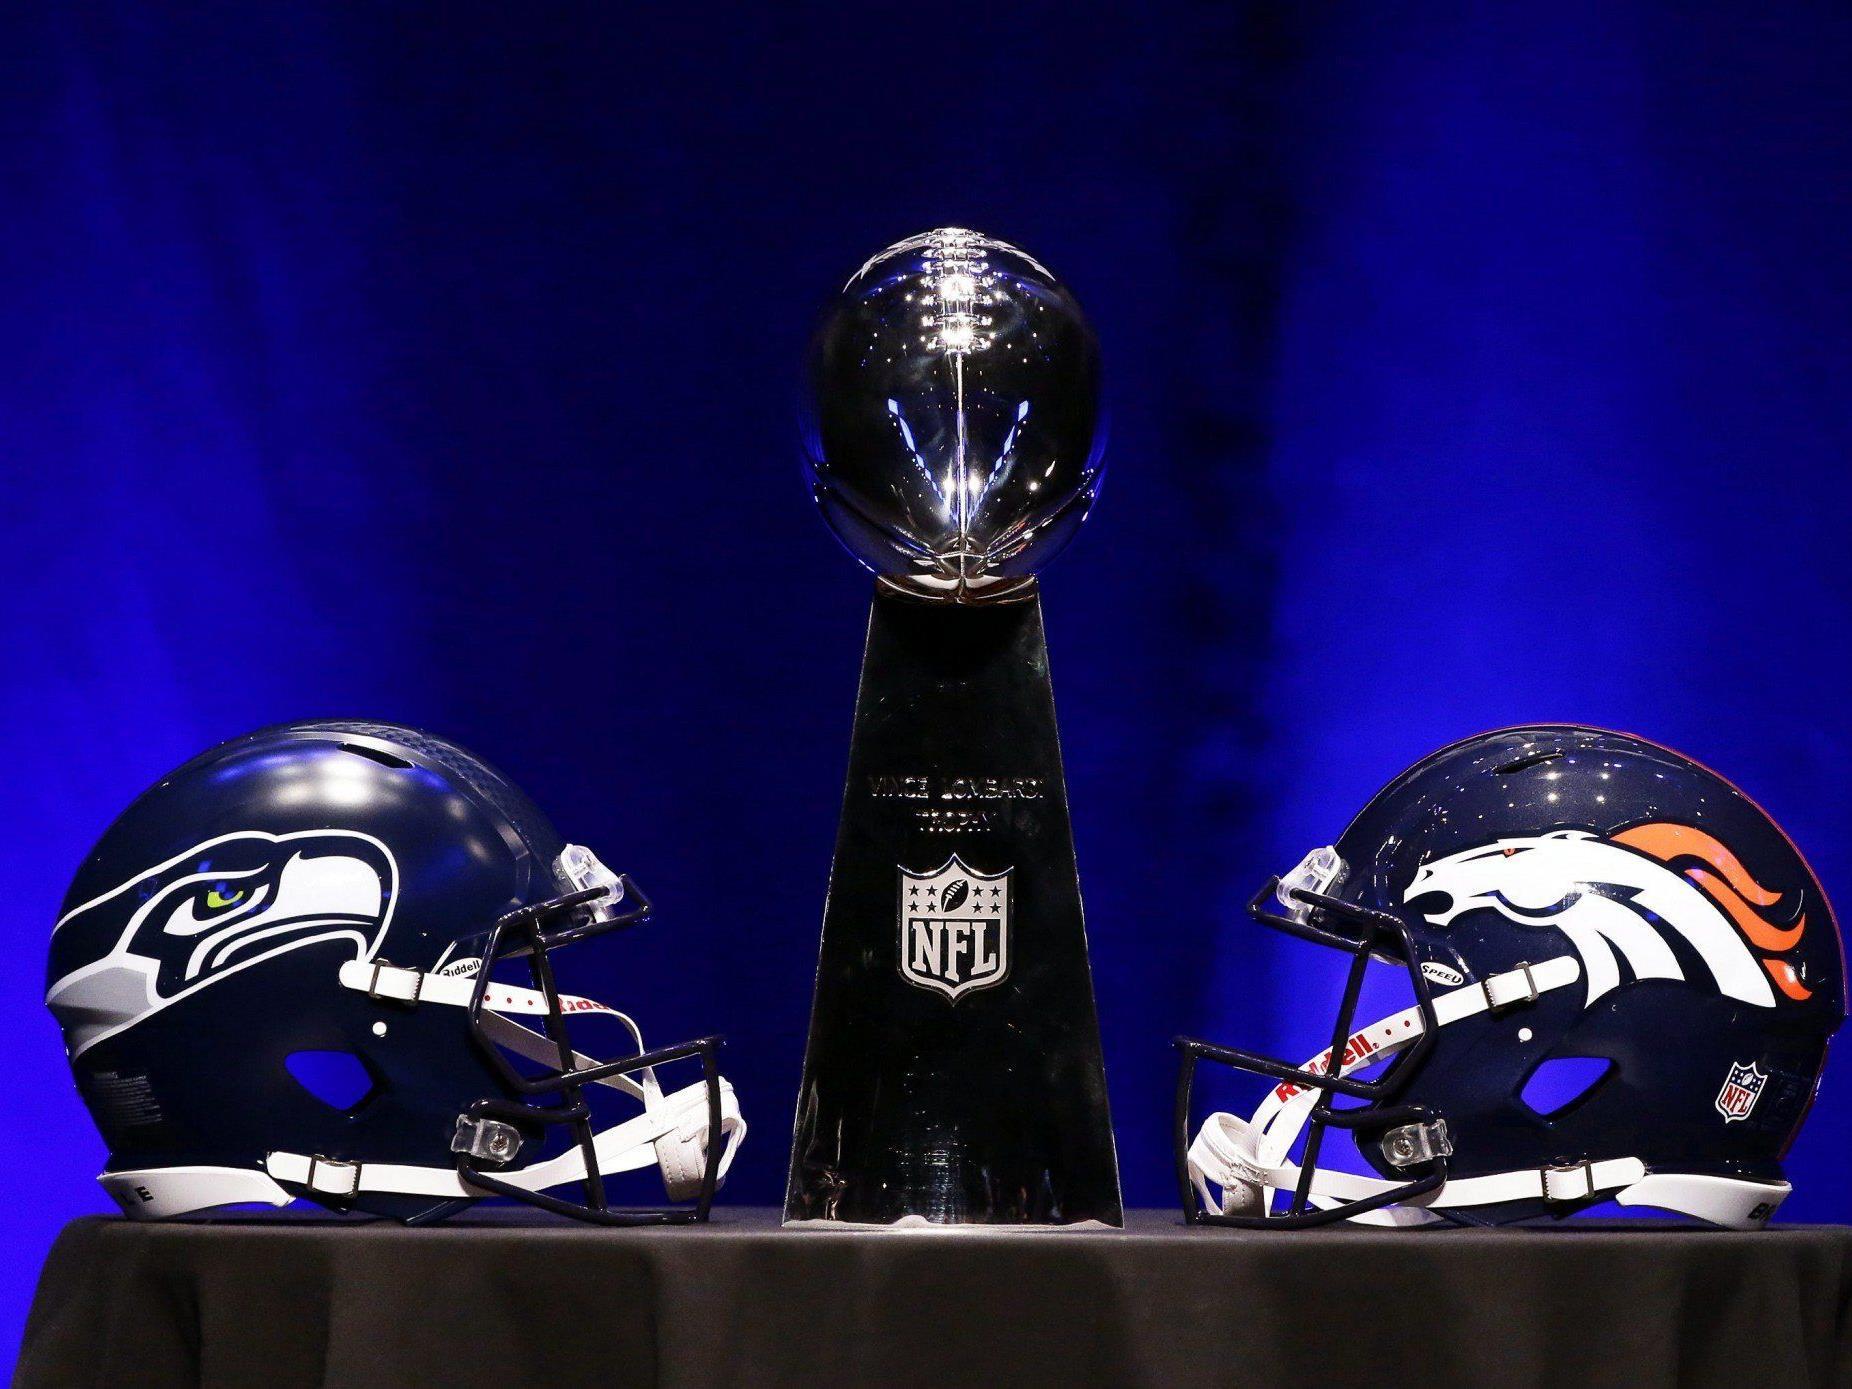 Seattle Seahawks gegen Denver Broncos um die Vince Lombardi Trophy im Super Bowl XLVIII.